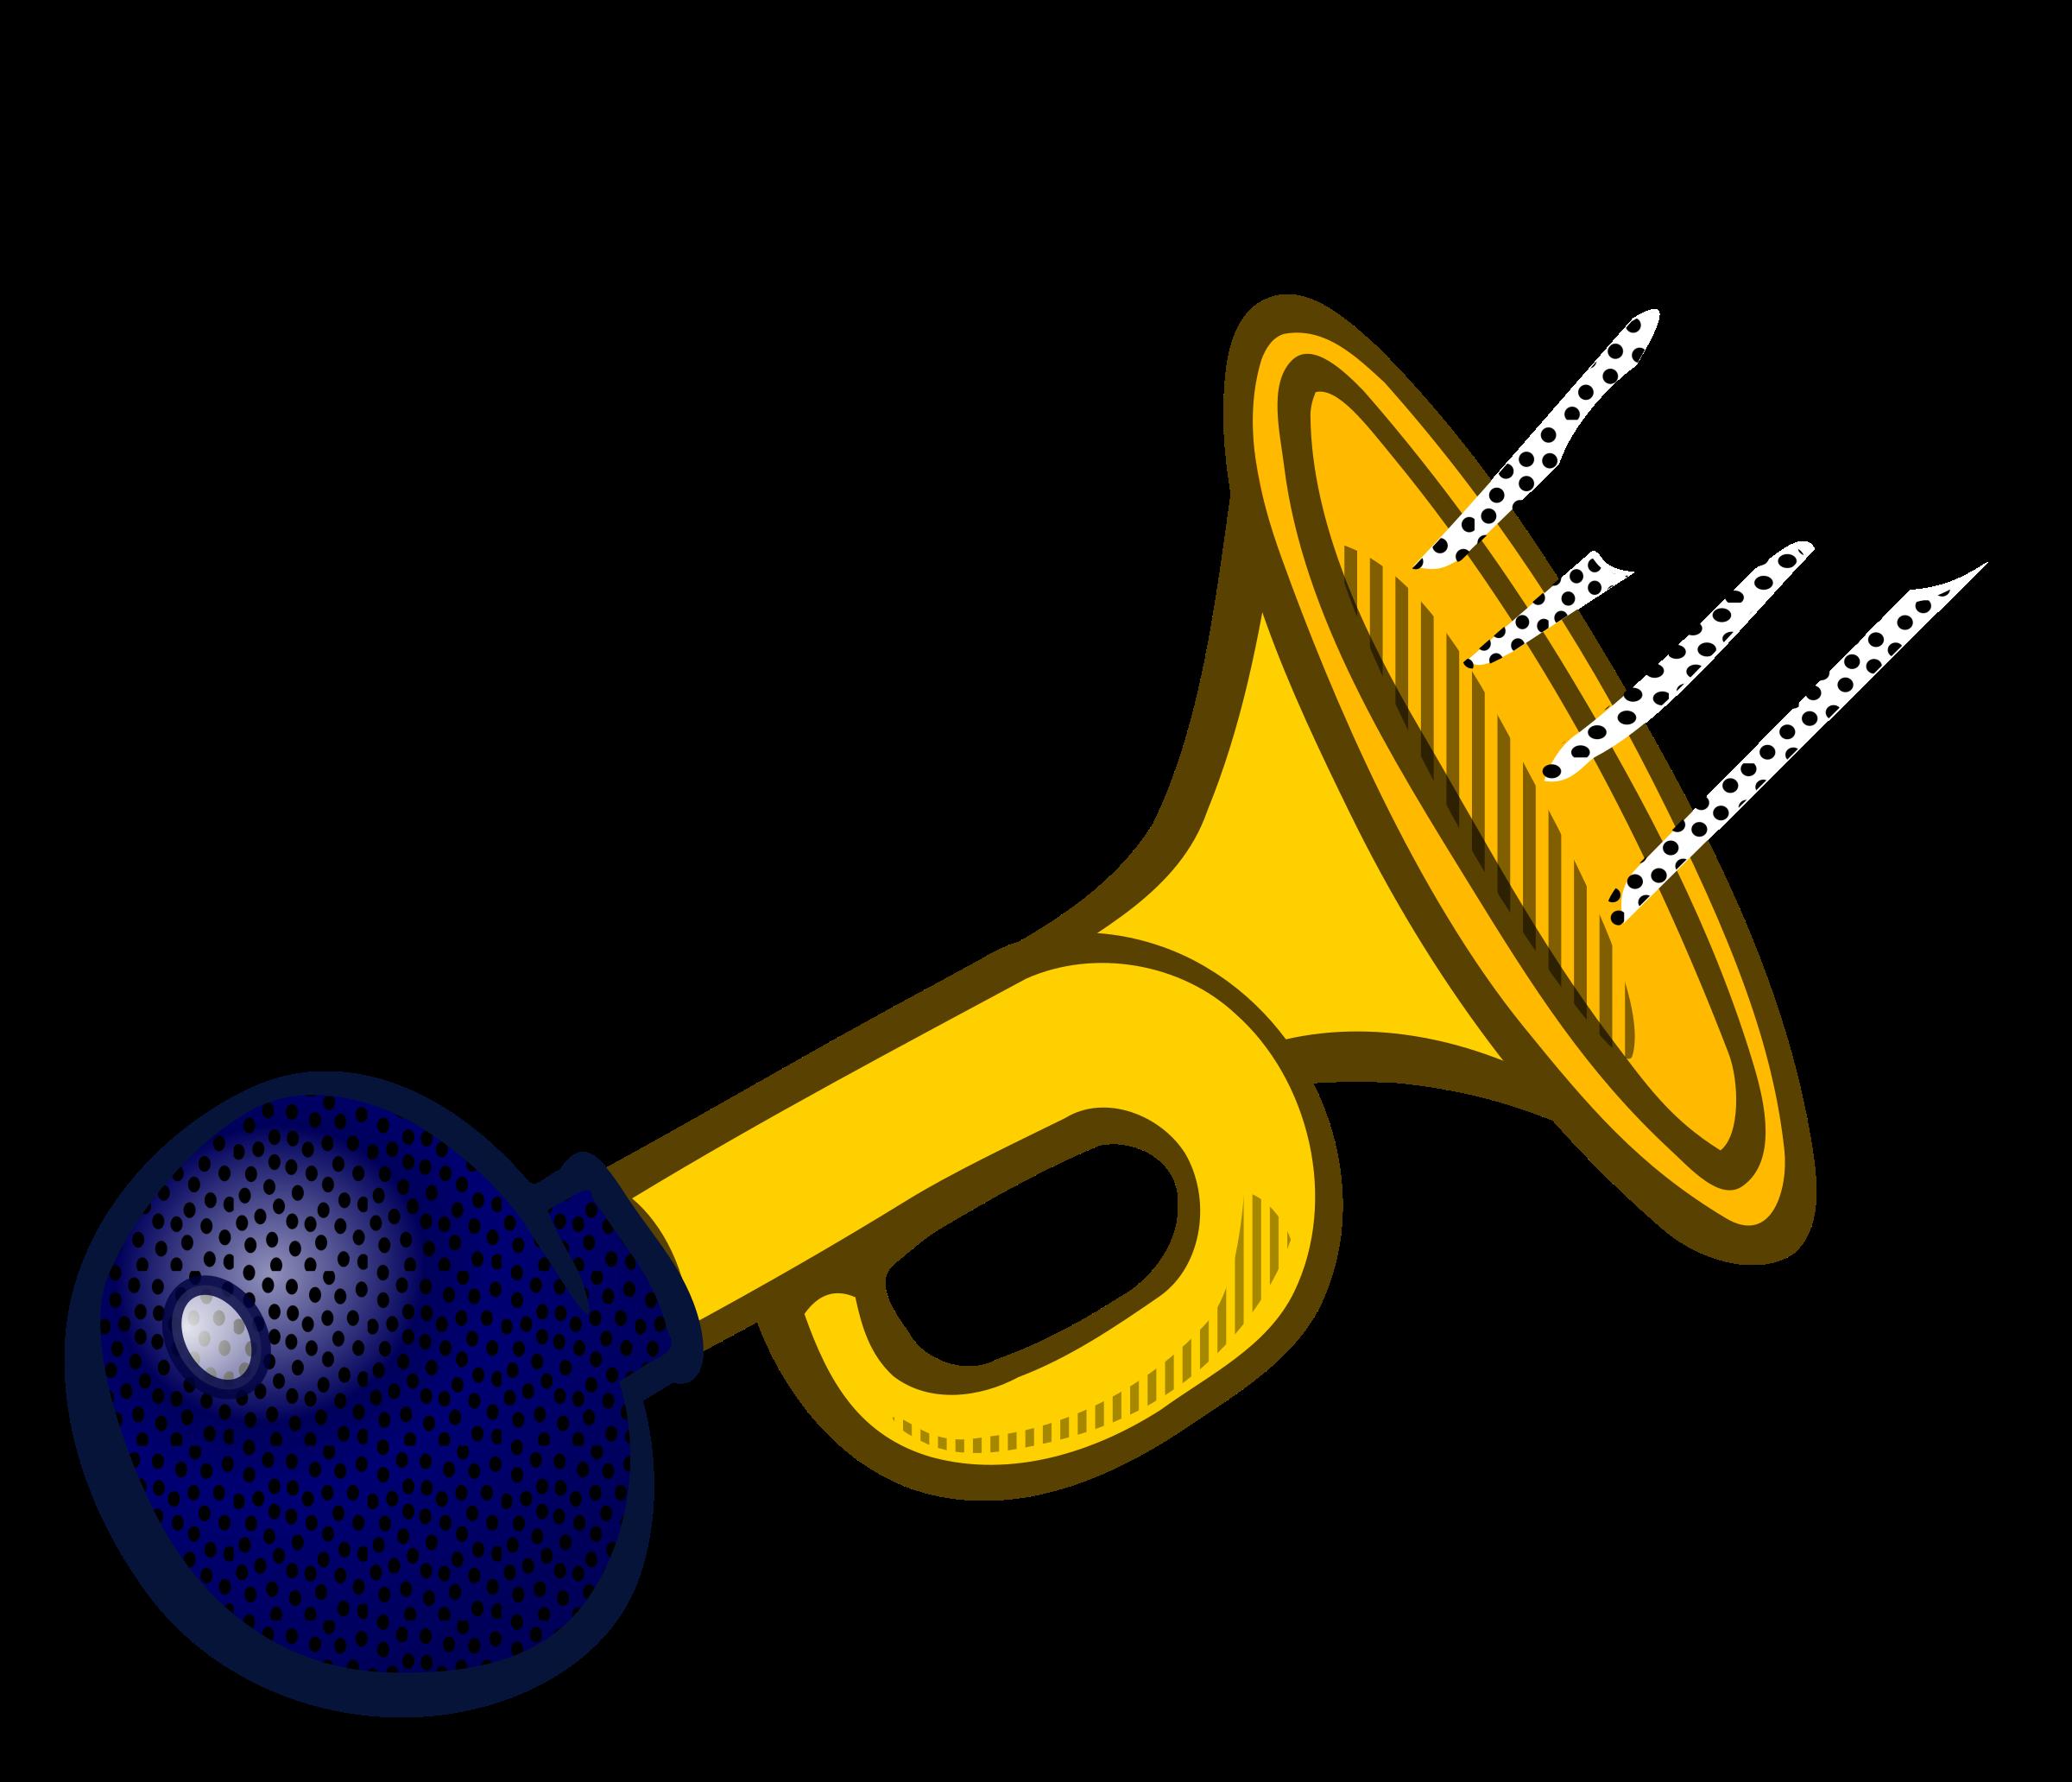 Thorn guildwars. Announcements clipart horn